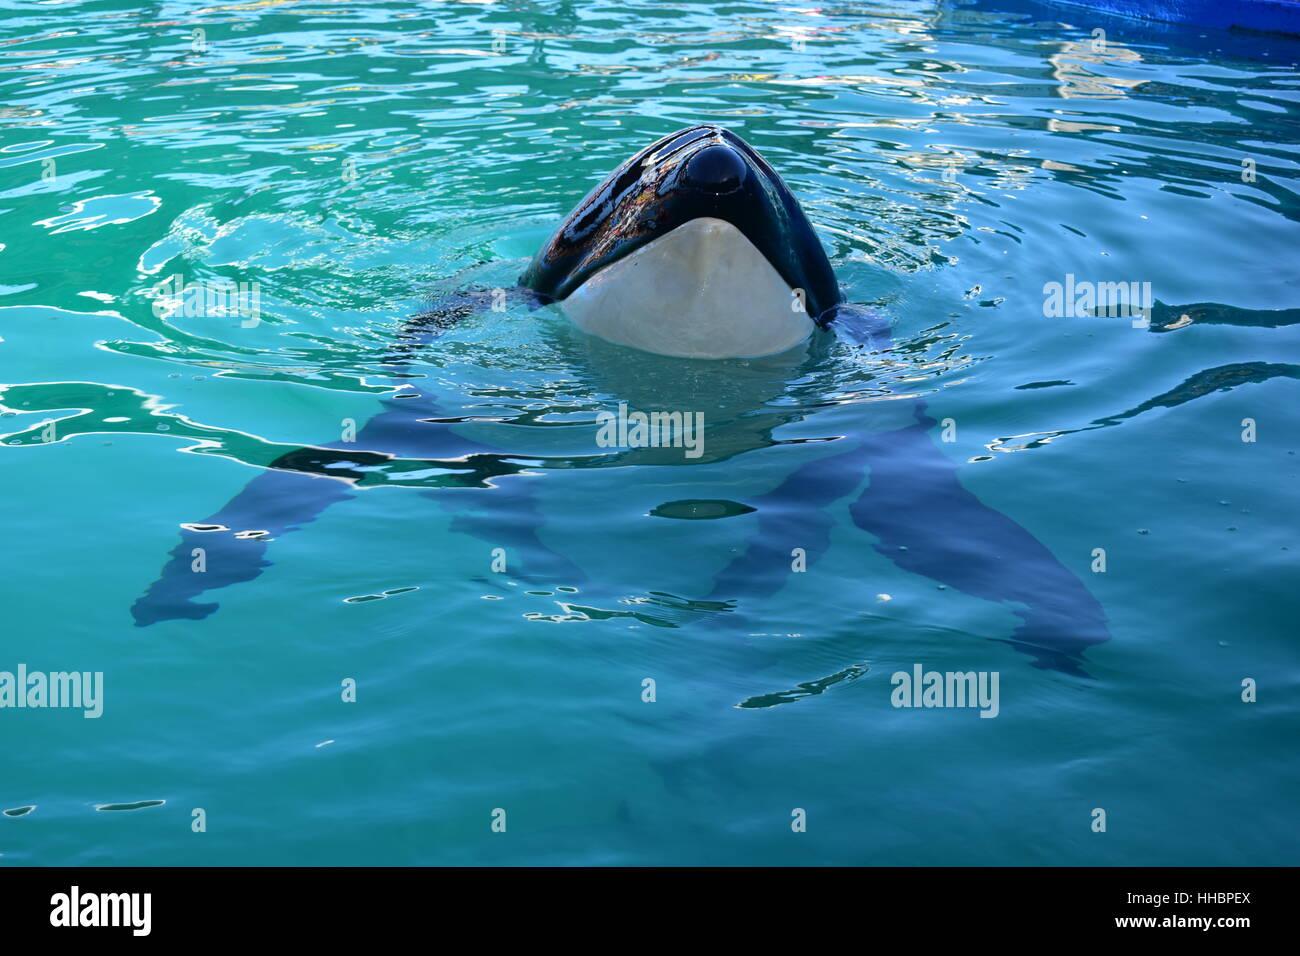 Miami, Florida - USA - January 08, 2016:Killer Whale Swimming - Stock Image